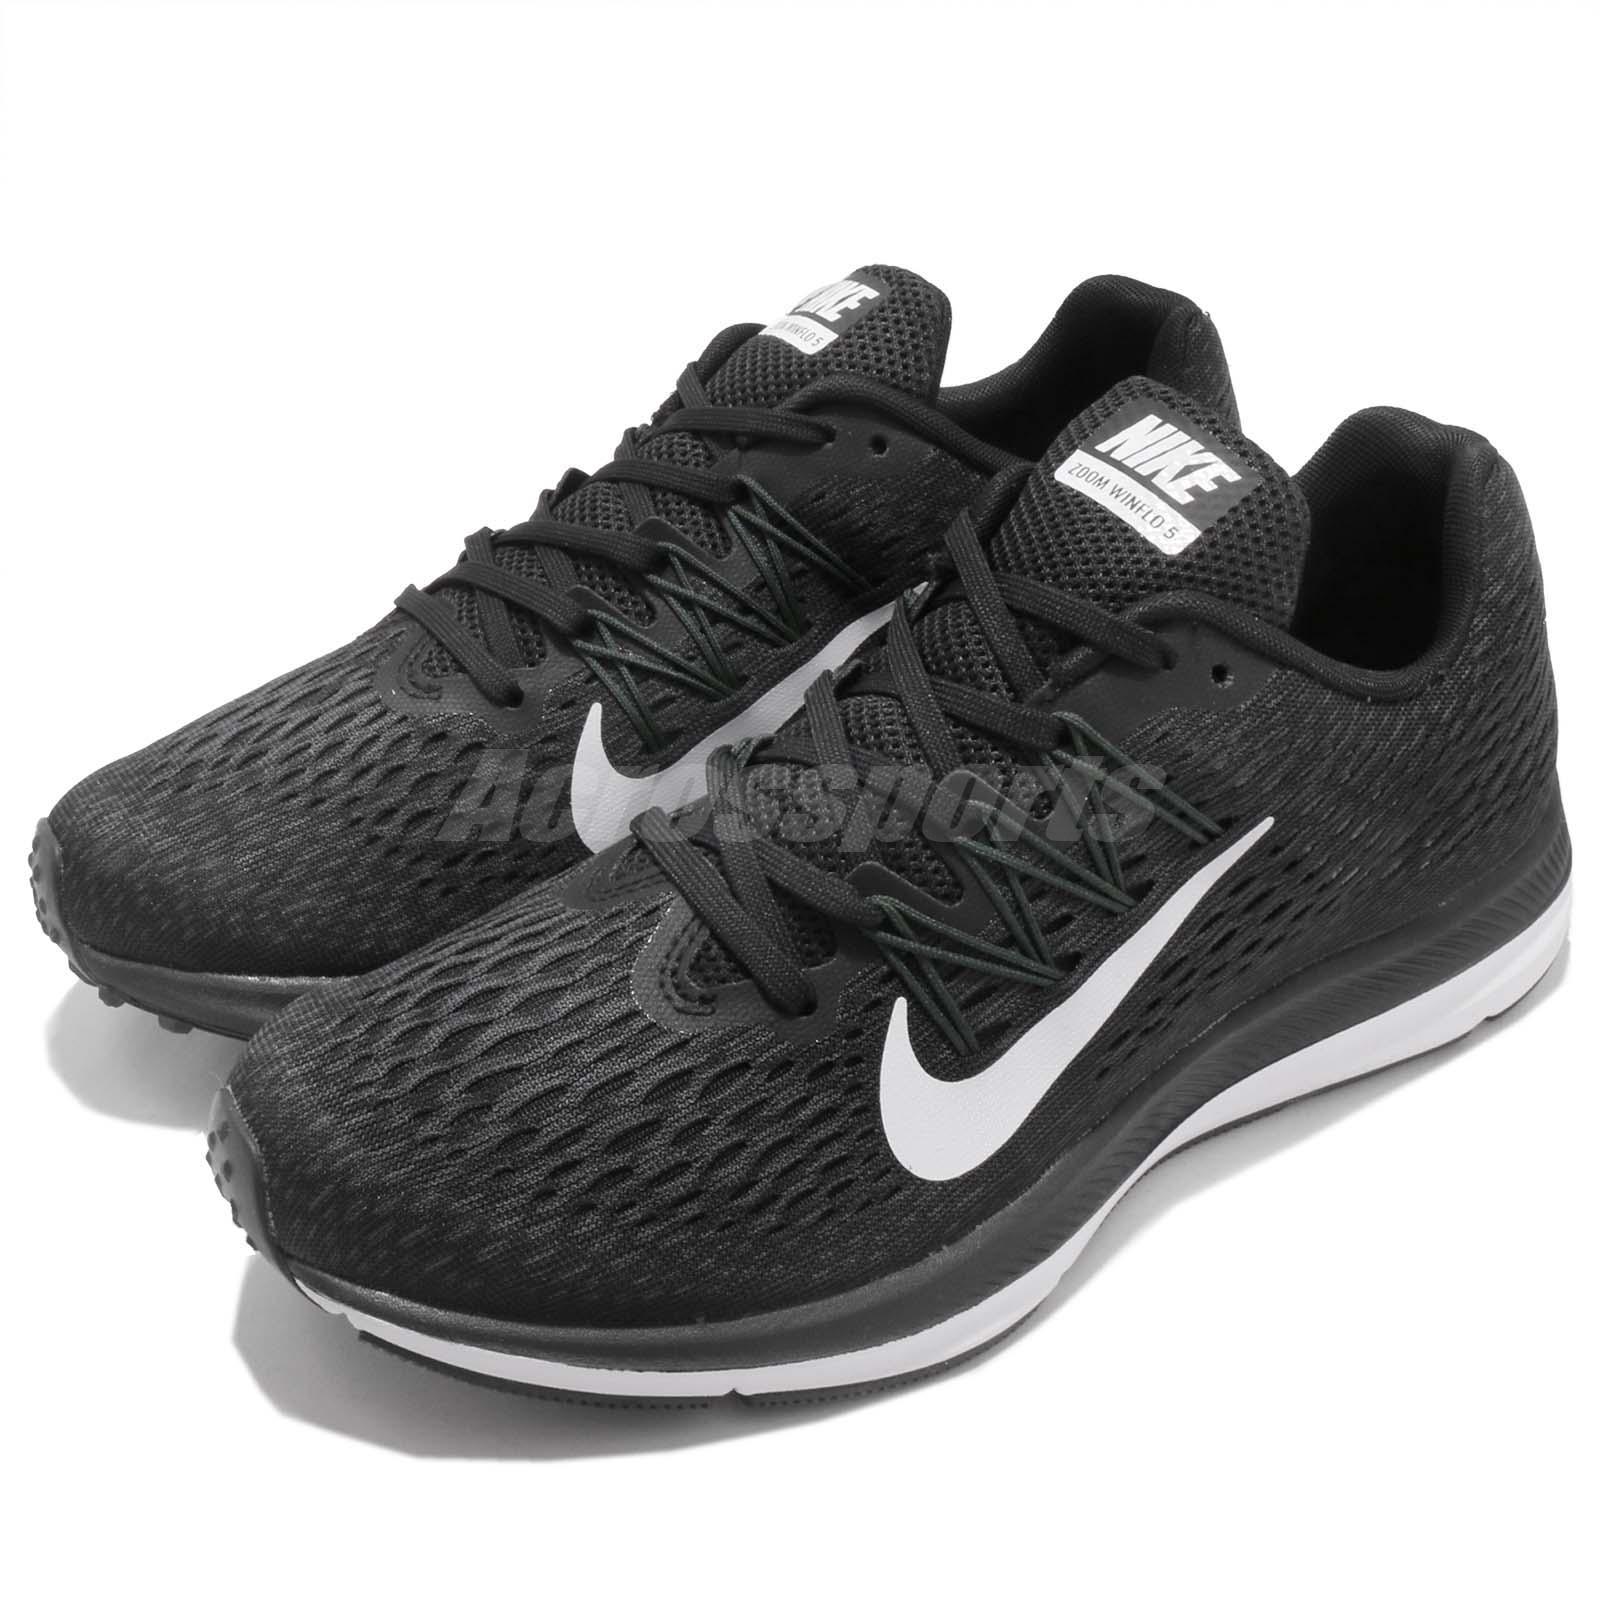 Zapatillas Nike Air Zoom Winflo 5 Mujer Running Aa7414 001